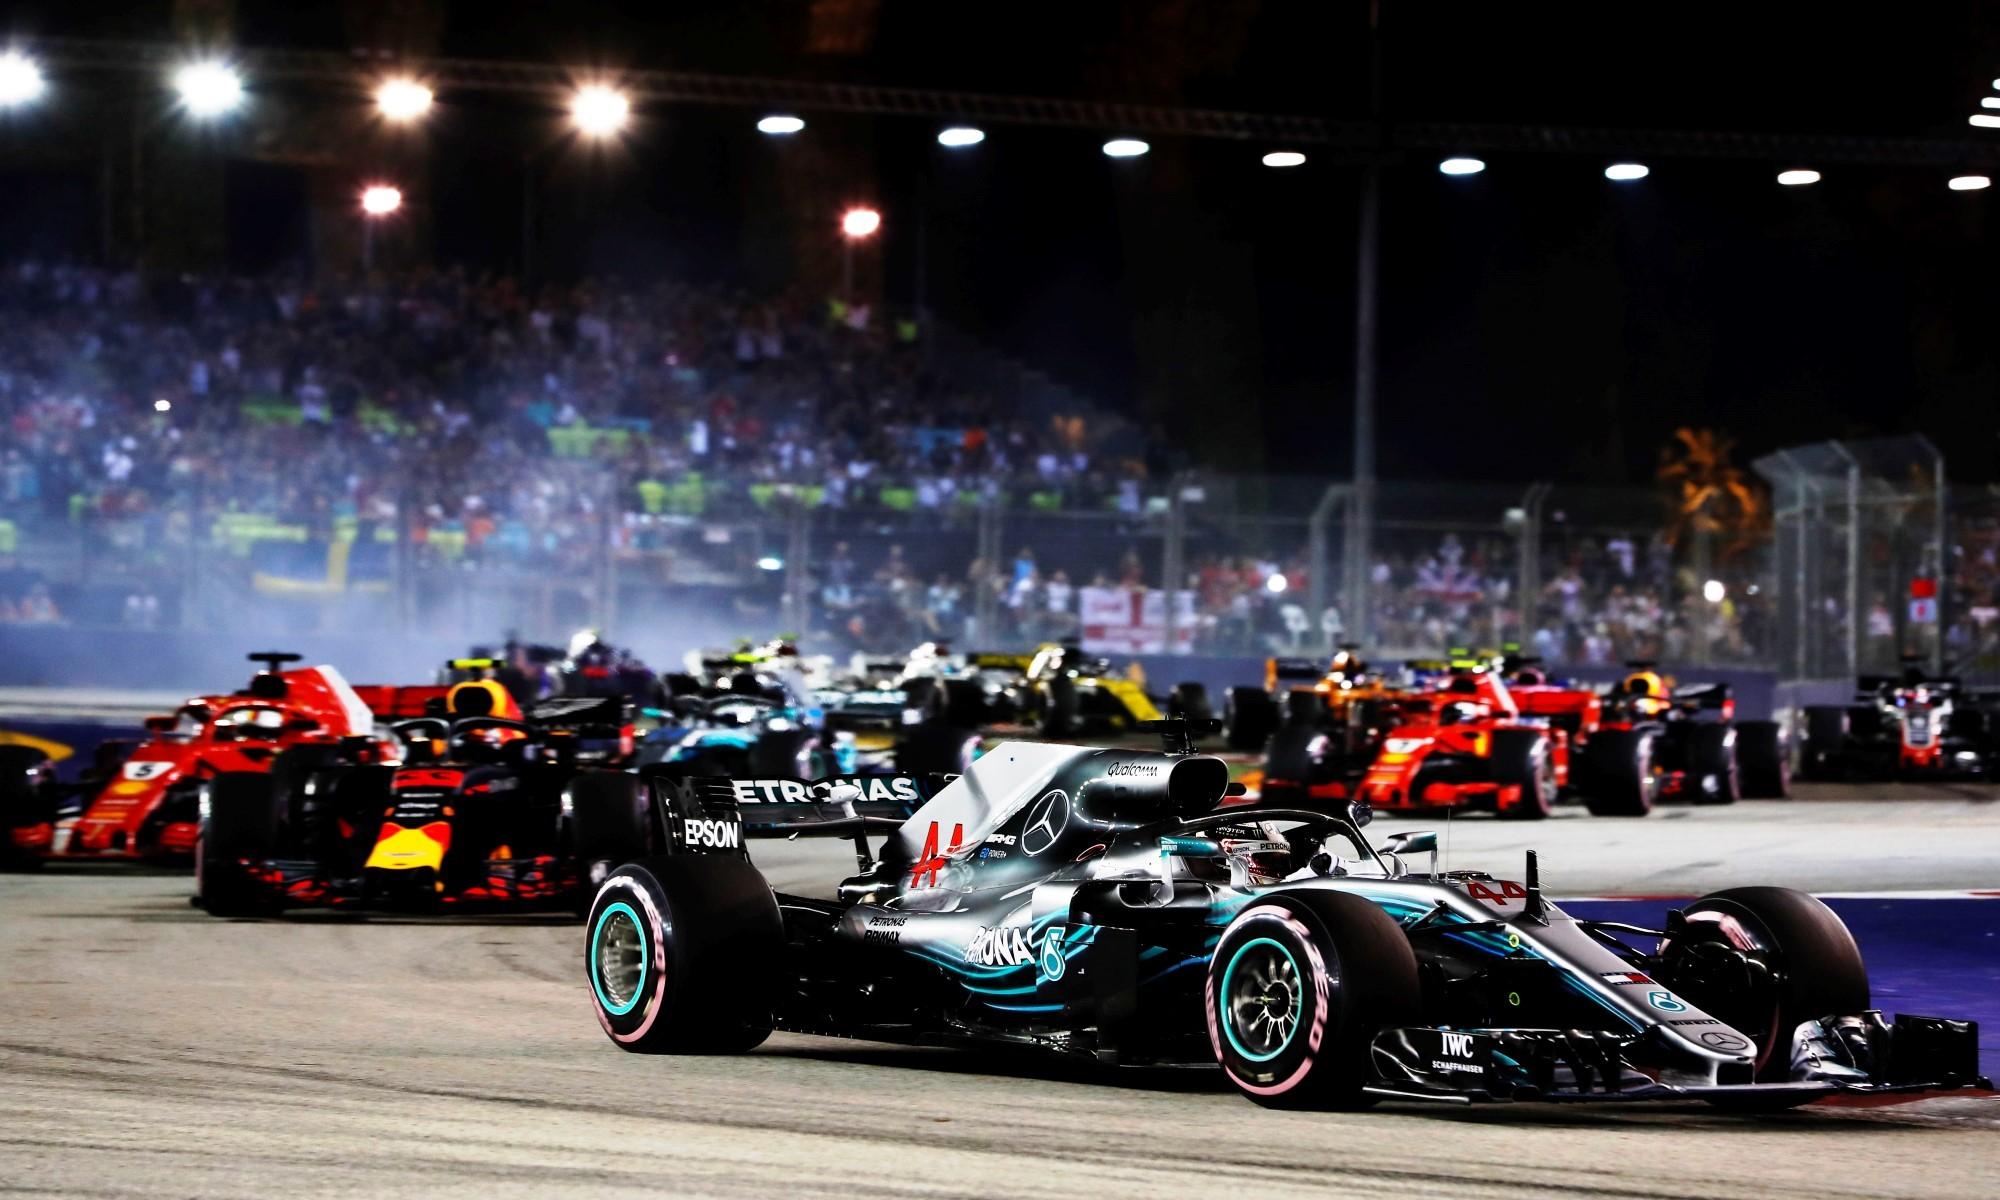 Hamilton led from lap one